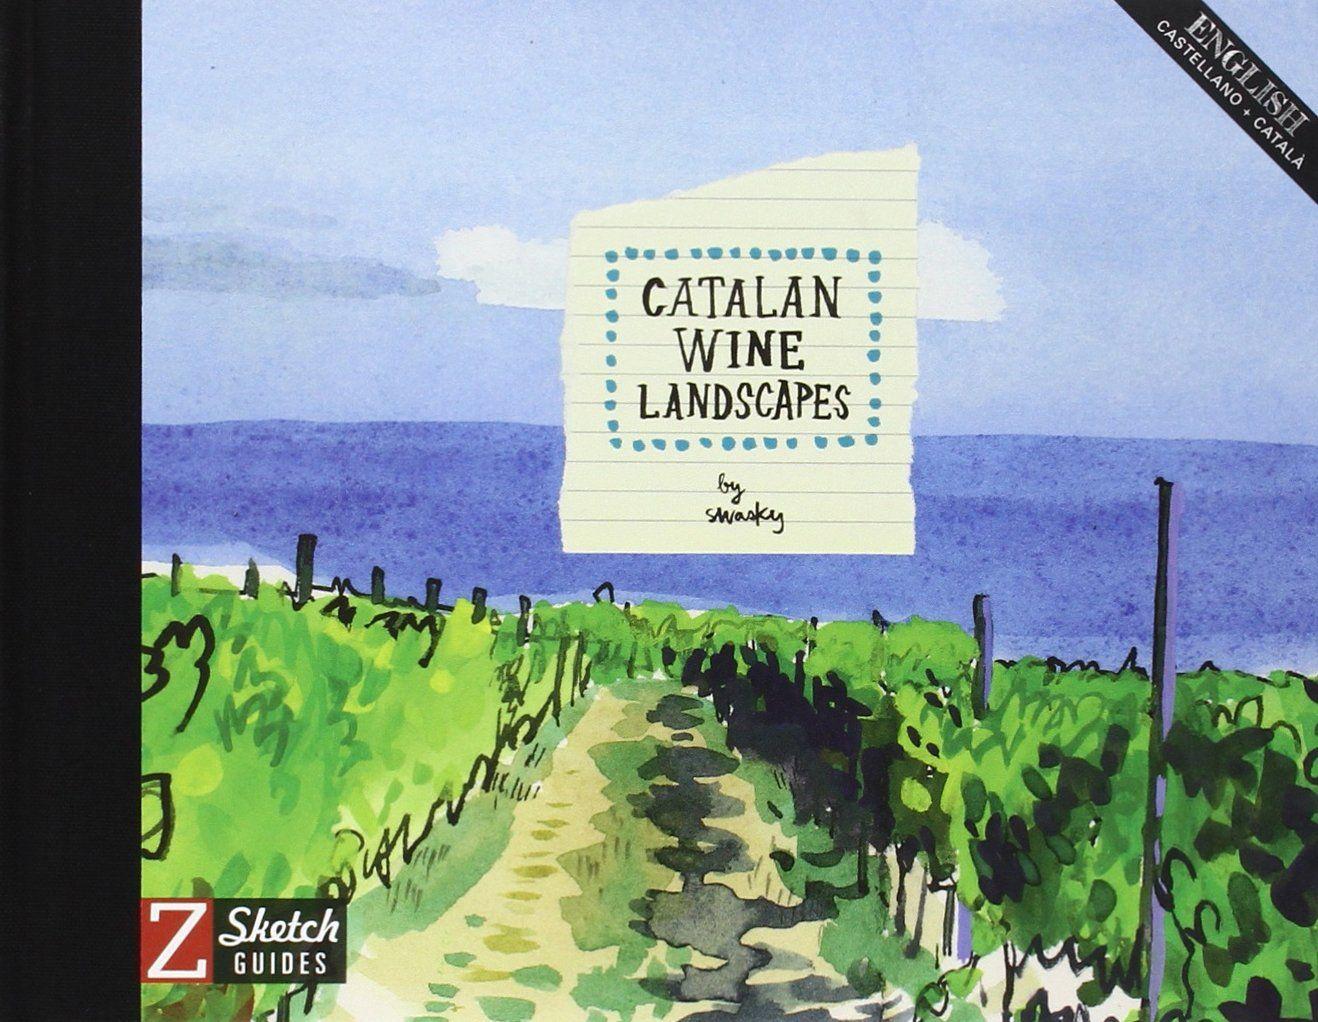 ABRIL-2015. Swasky. Catalan wine landscapes. 663 SWA.